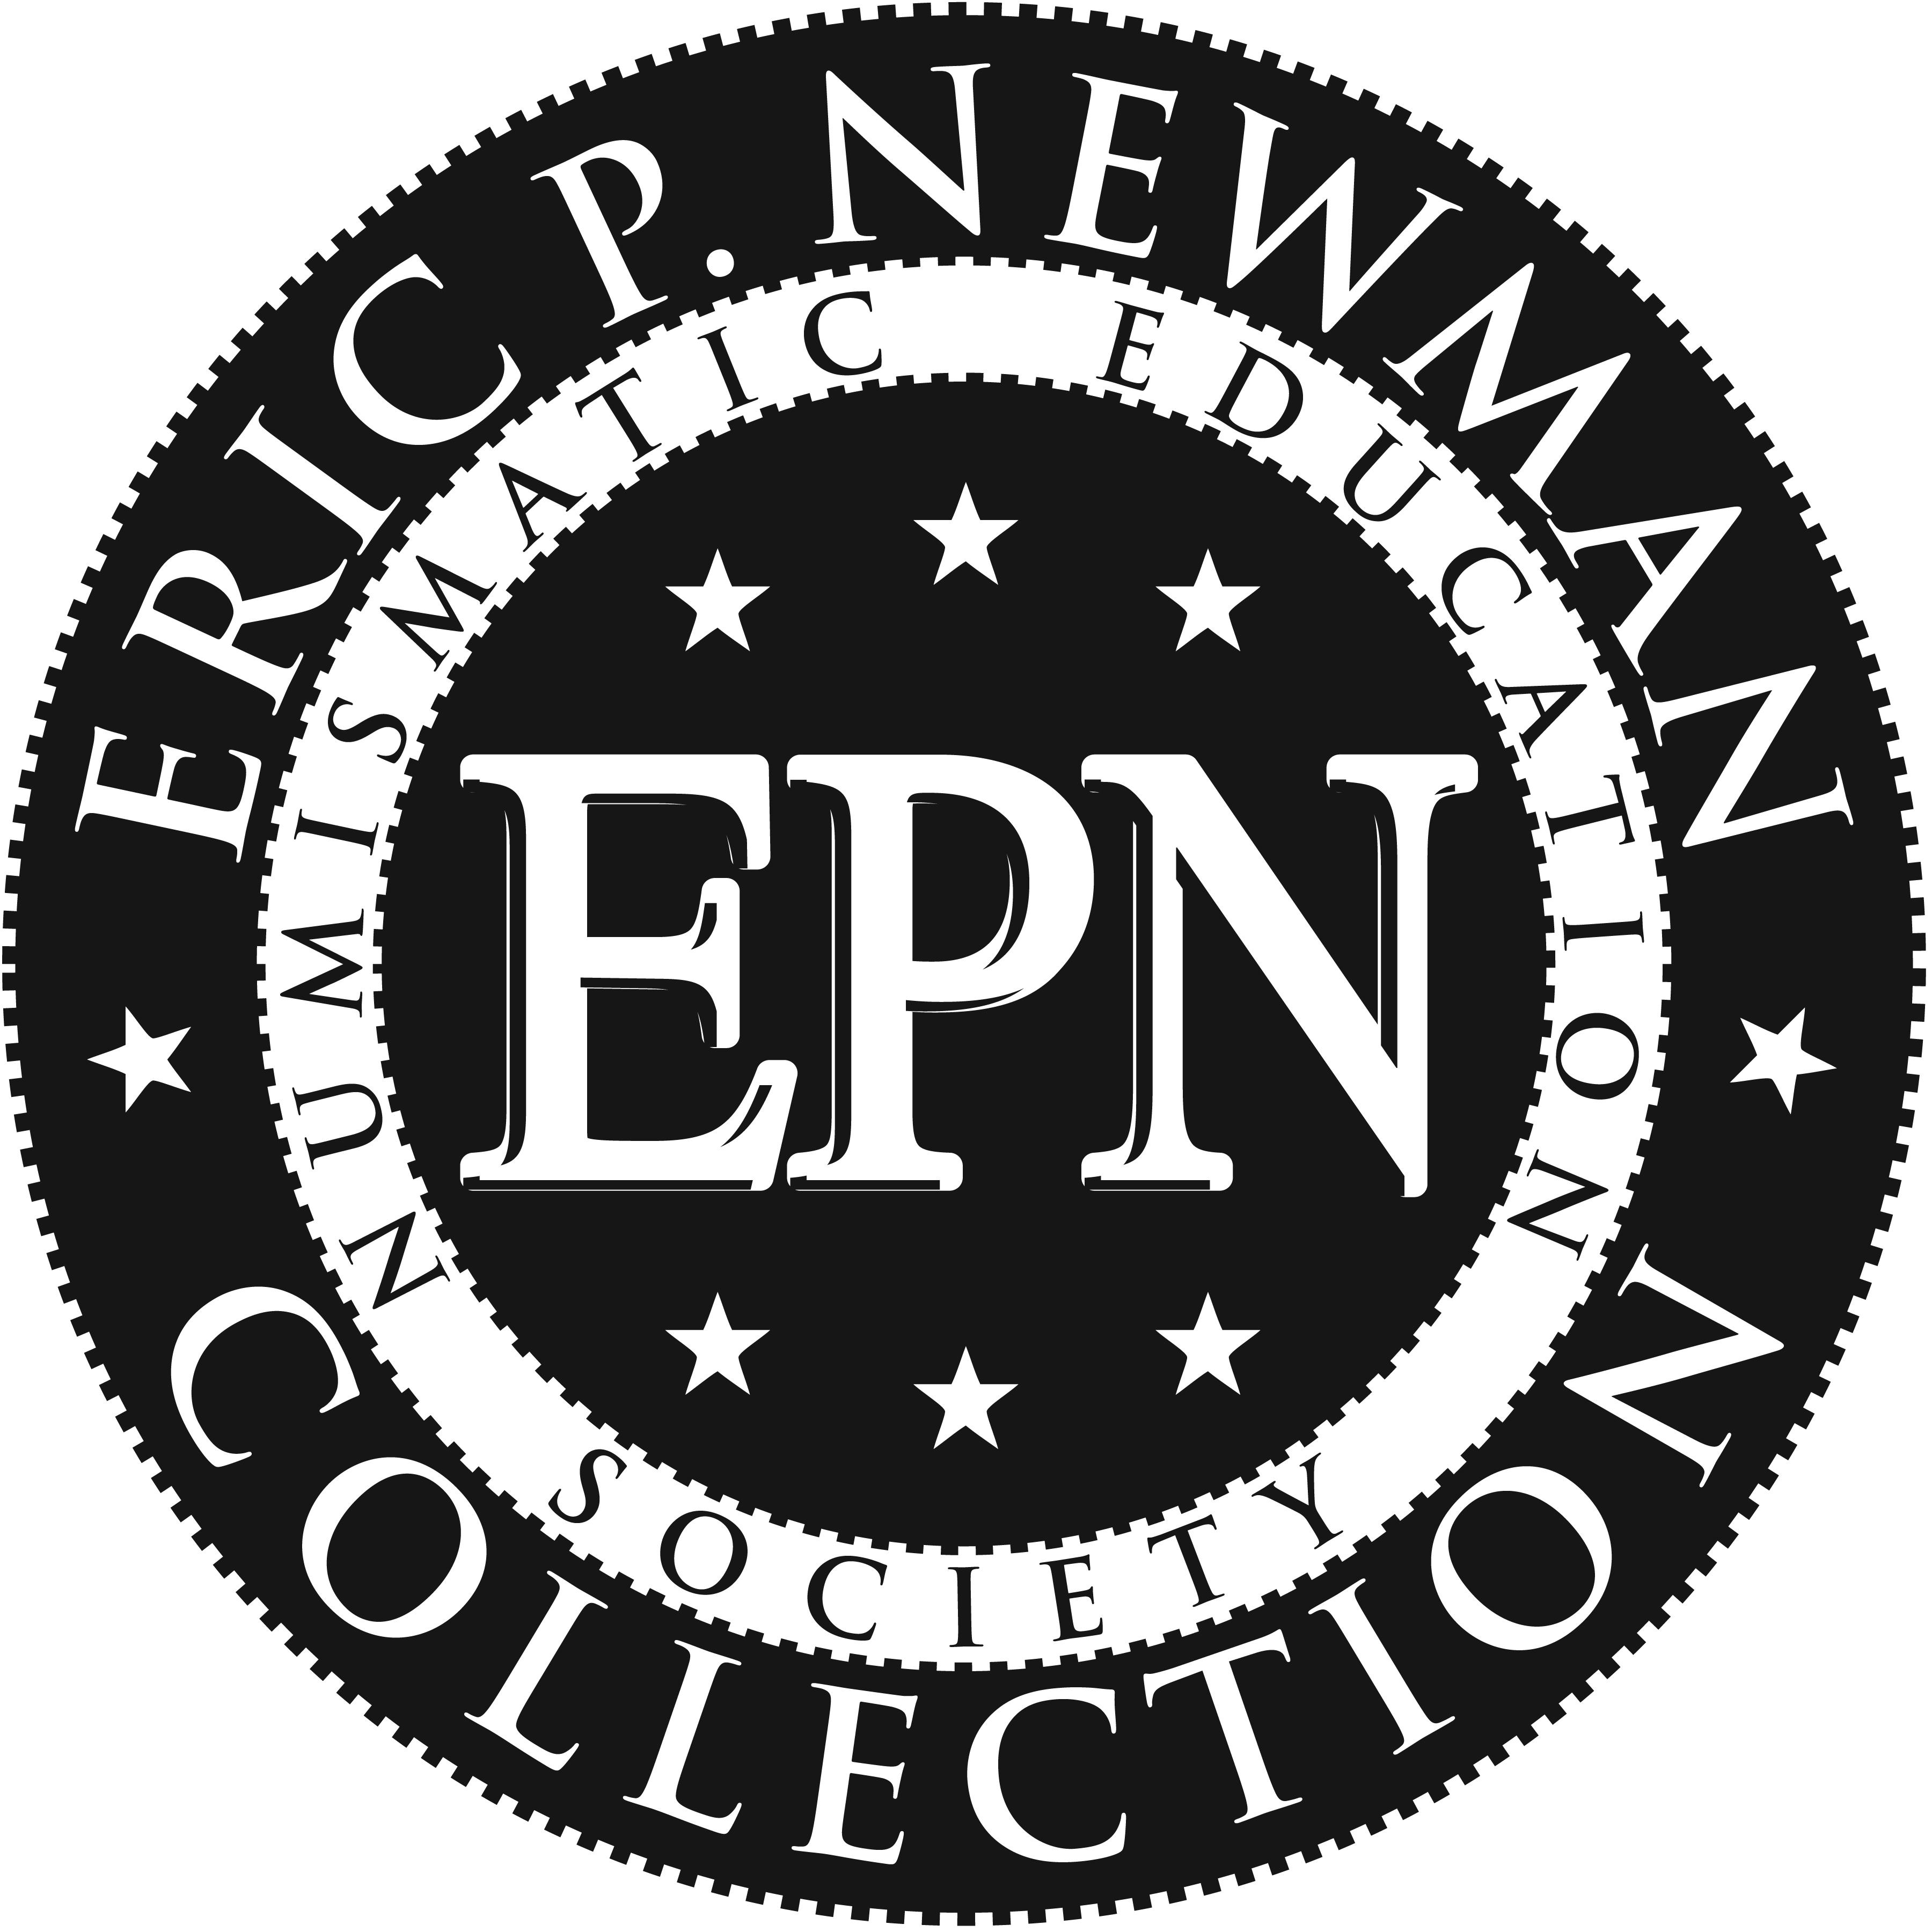 main image for PRESS RELEASE: NGC Certifies Eric P. Newman Part IX